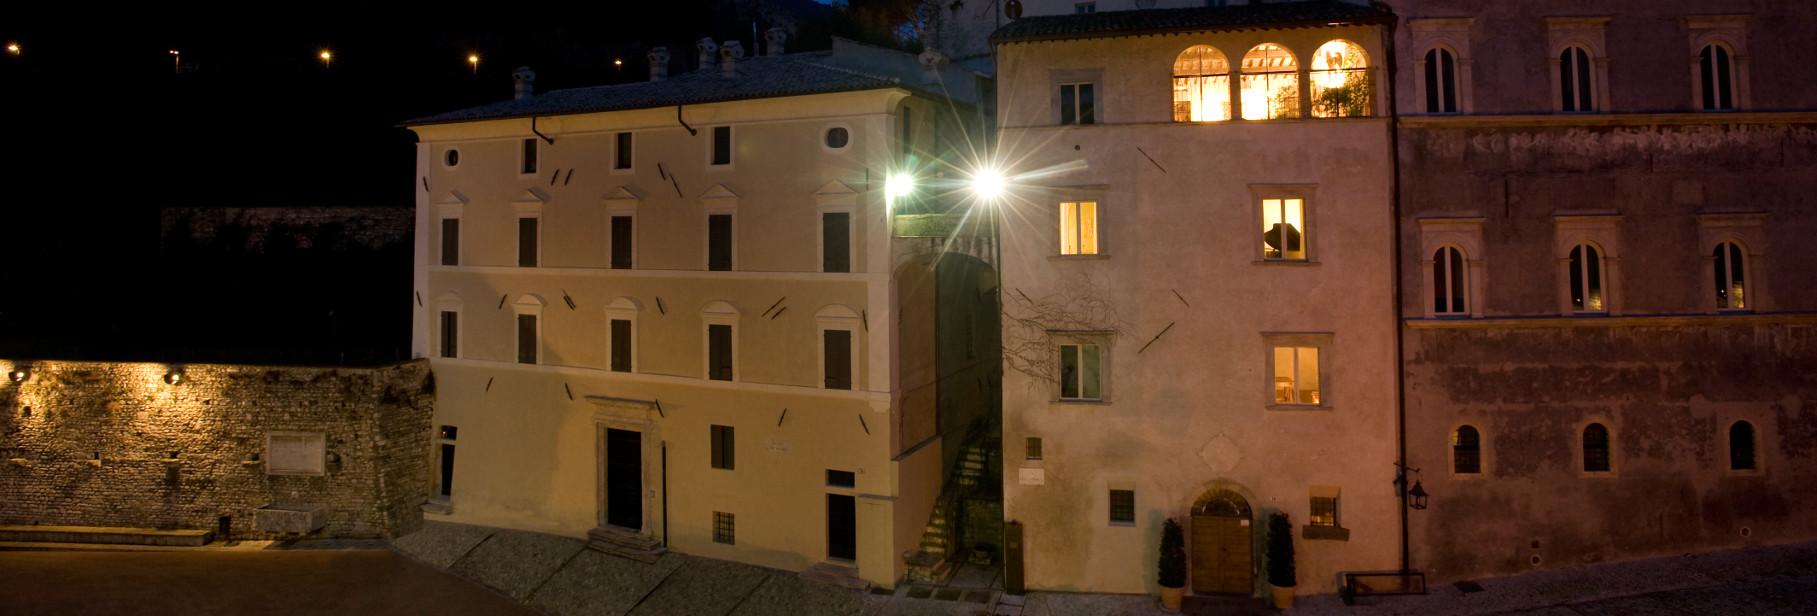 Casa Menotti in notturna